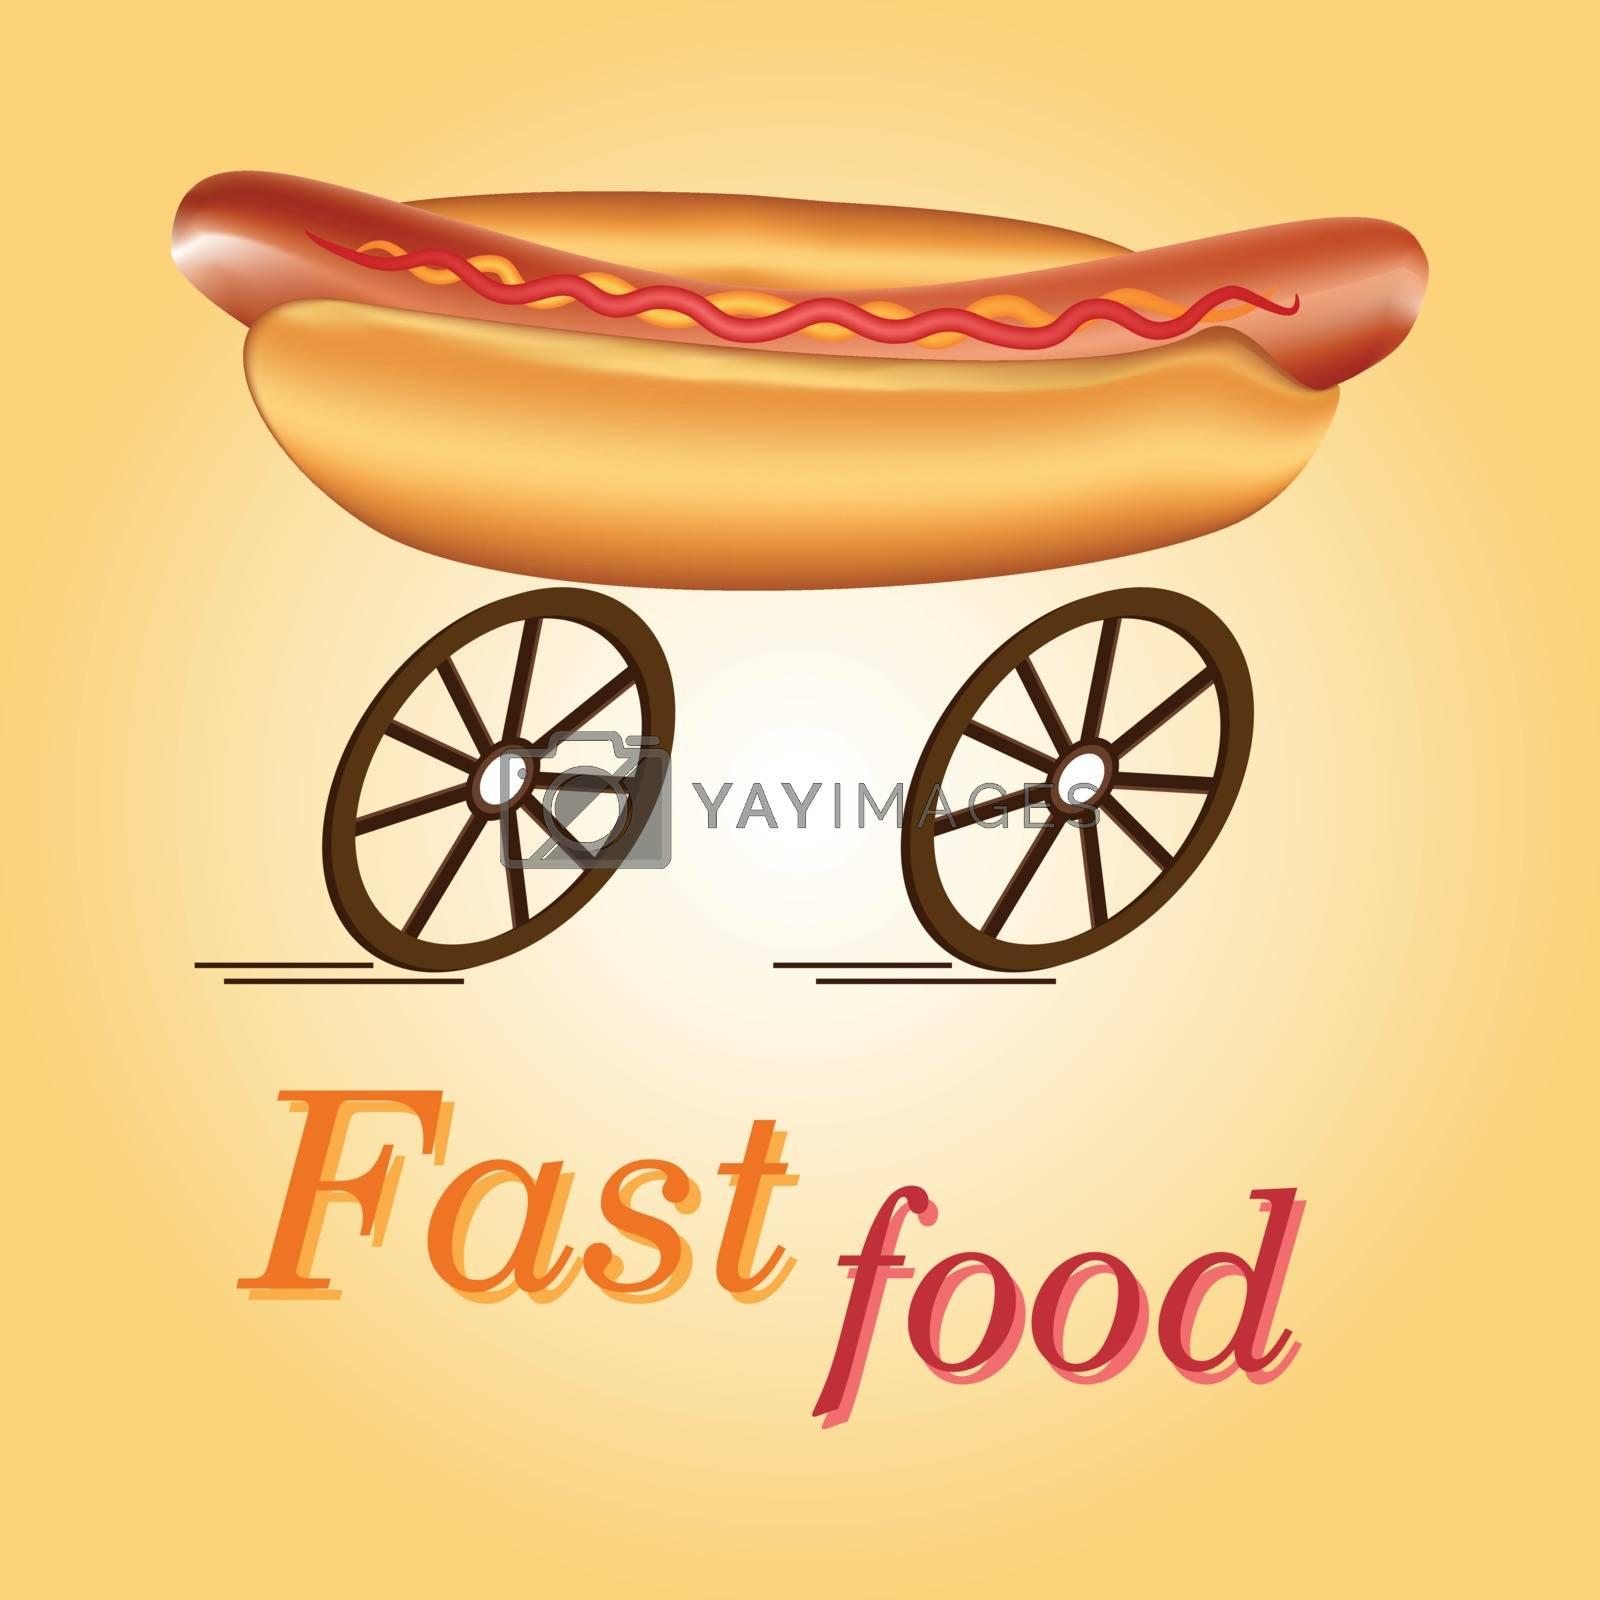 Hot dog on wheels as idea of fast food